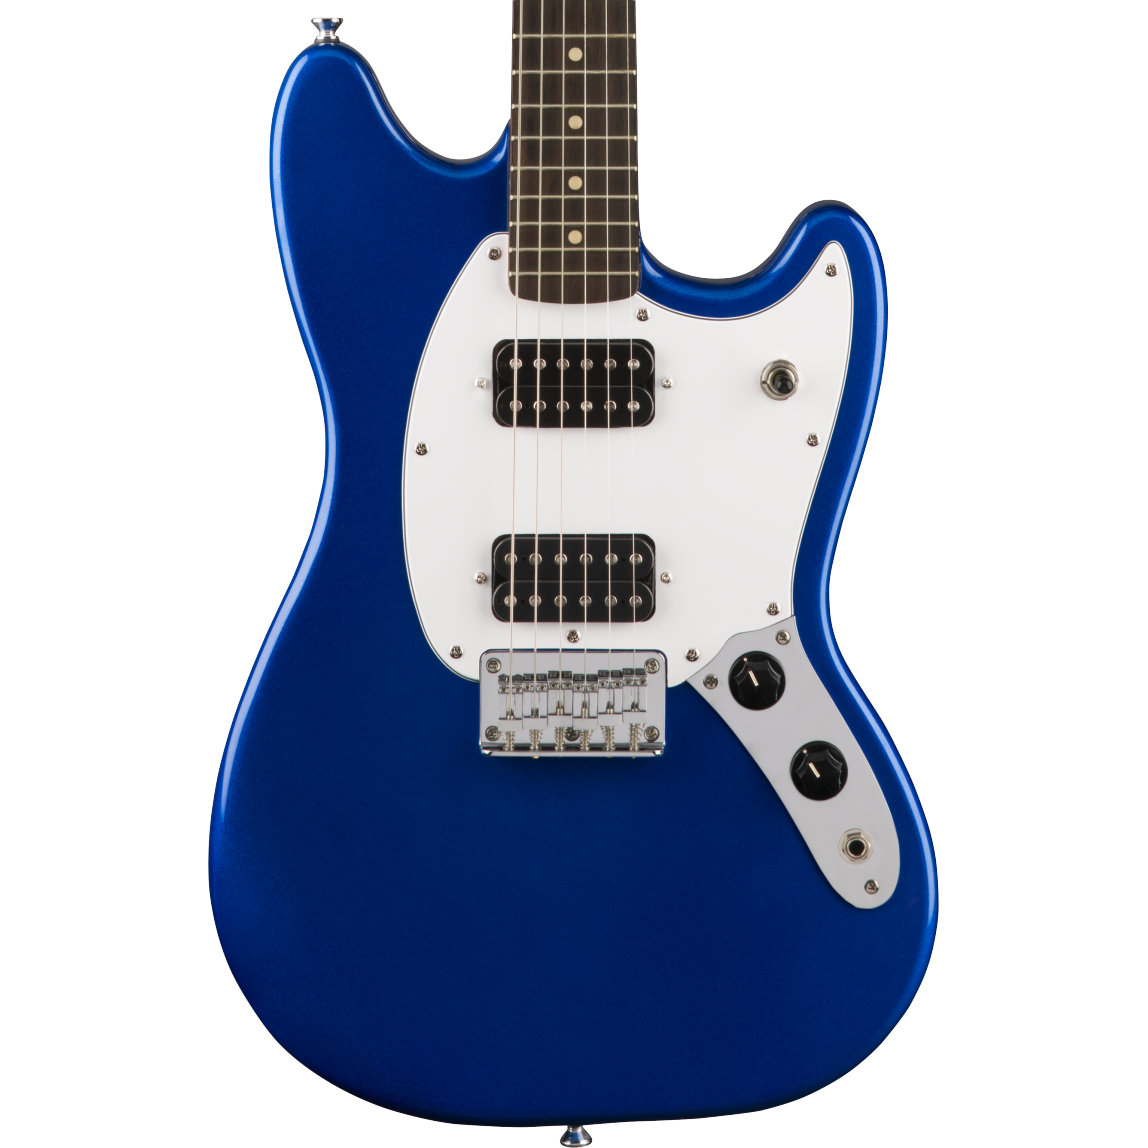 Squier Bullet Mustang HH - Laurel Fingerboard, Imperial Blue